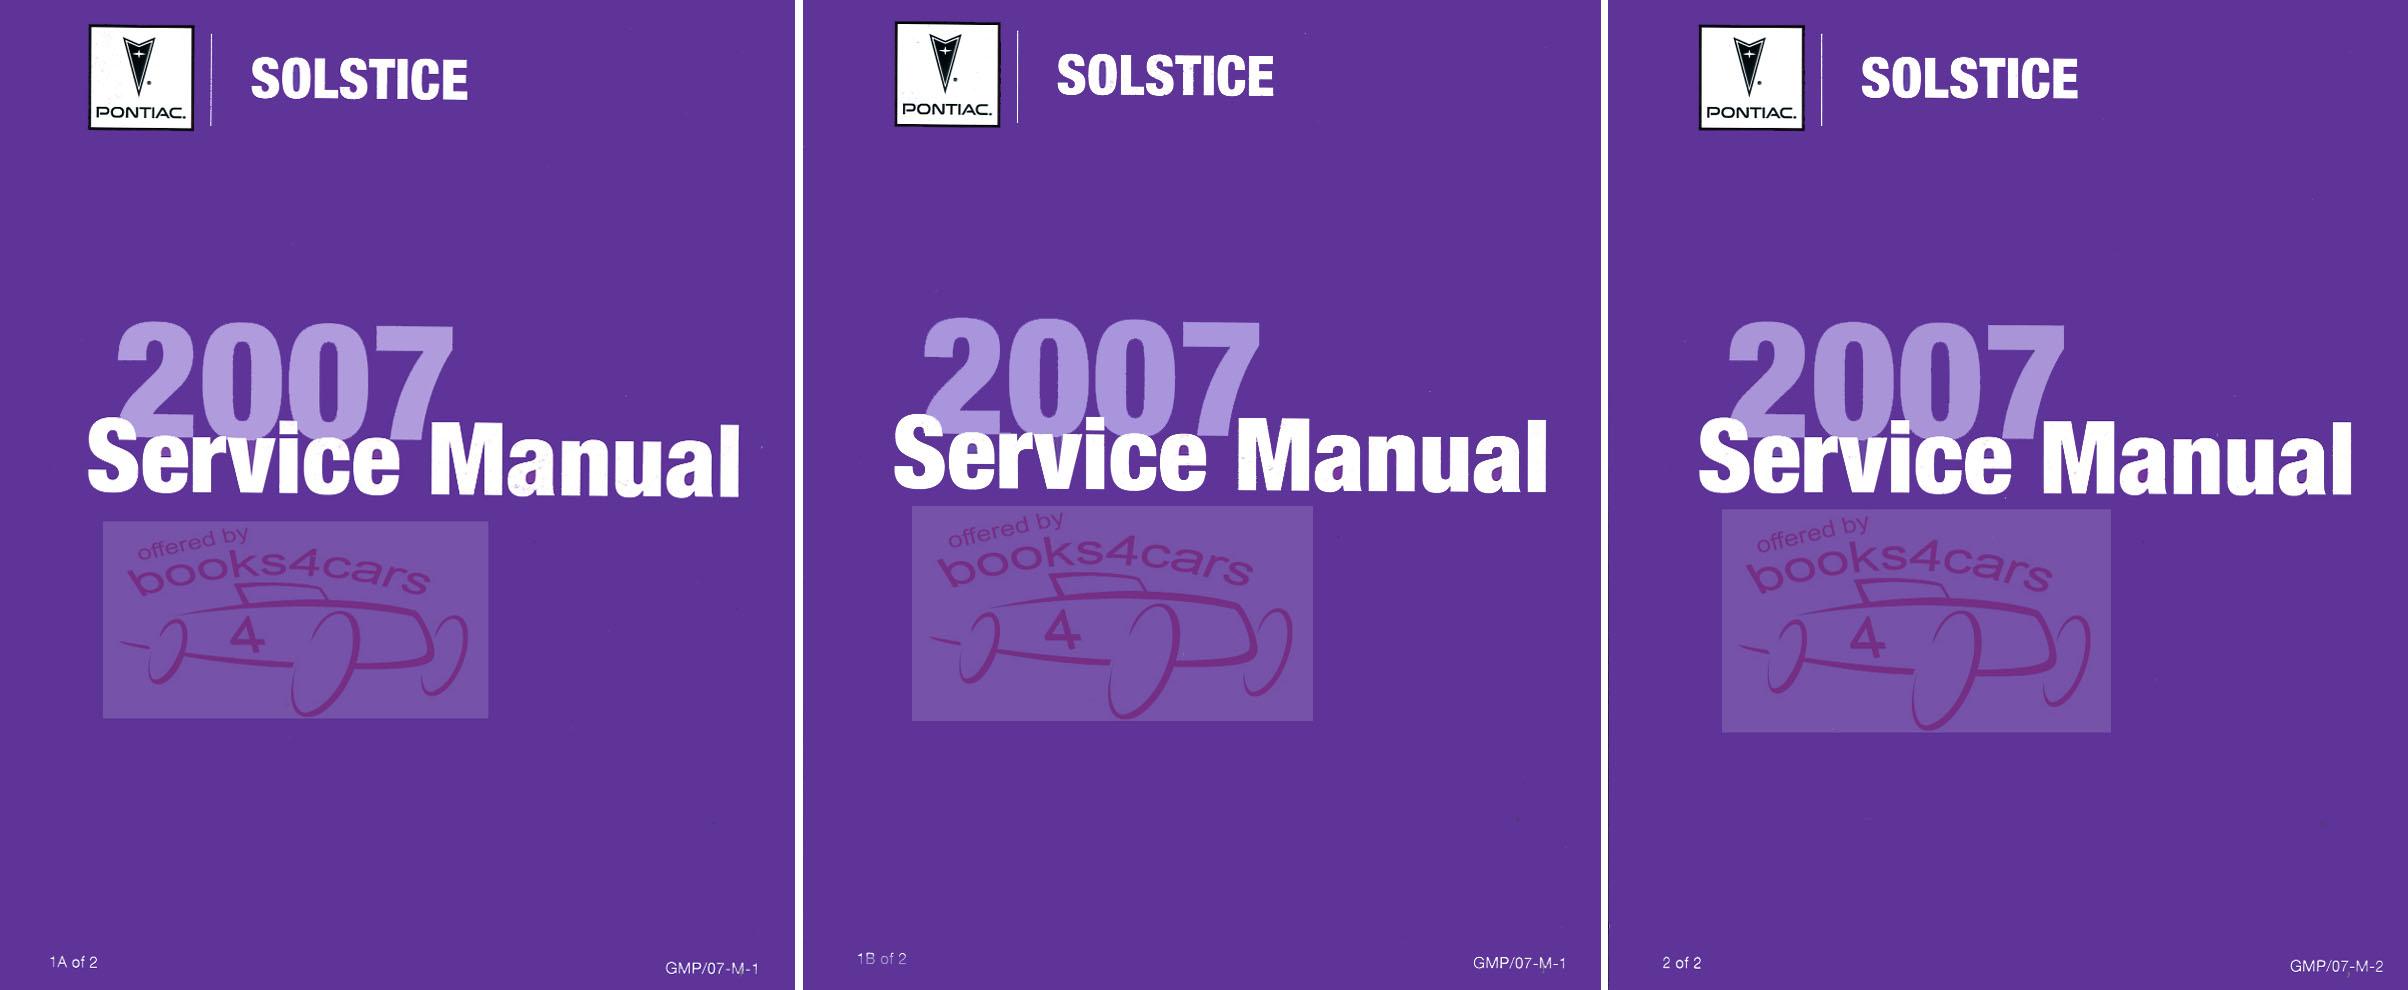 shop service solstice repair manual 2007 pontiac set factory gm rh ebay com pontiac solstice owner's manual 2007 pontiac solstice owners manual 2007